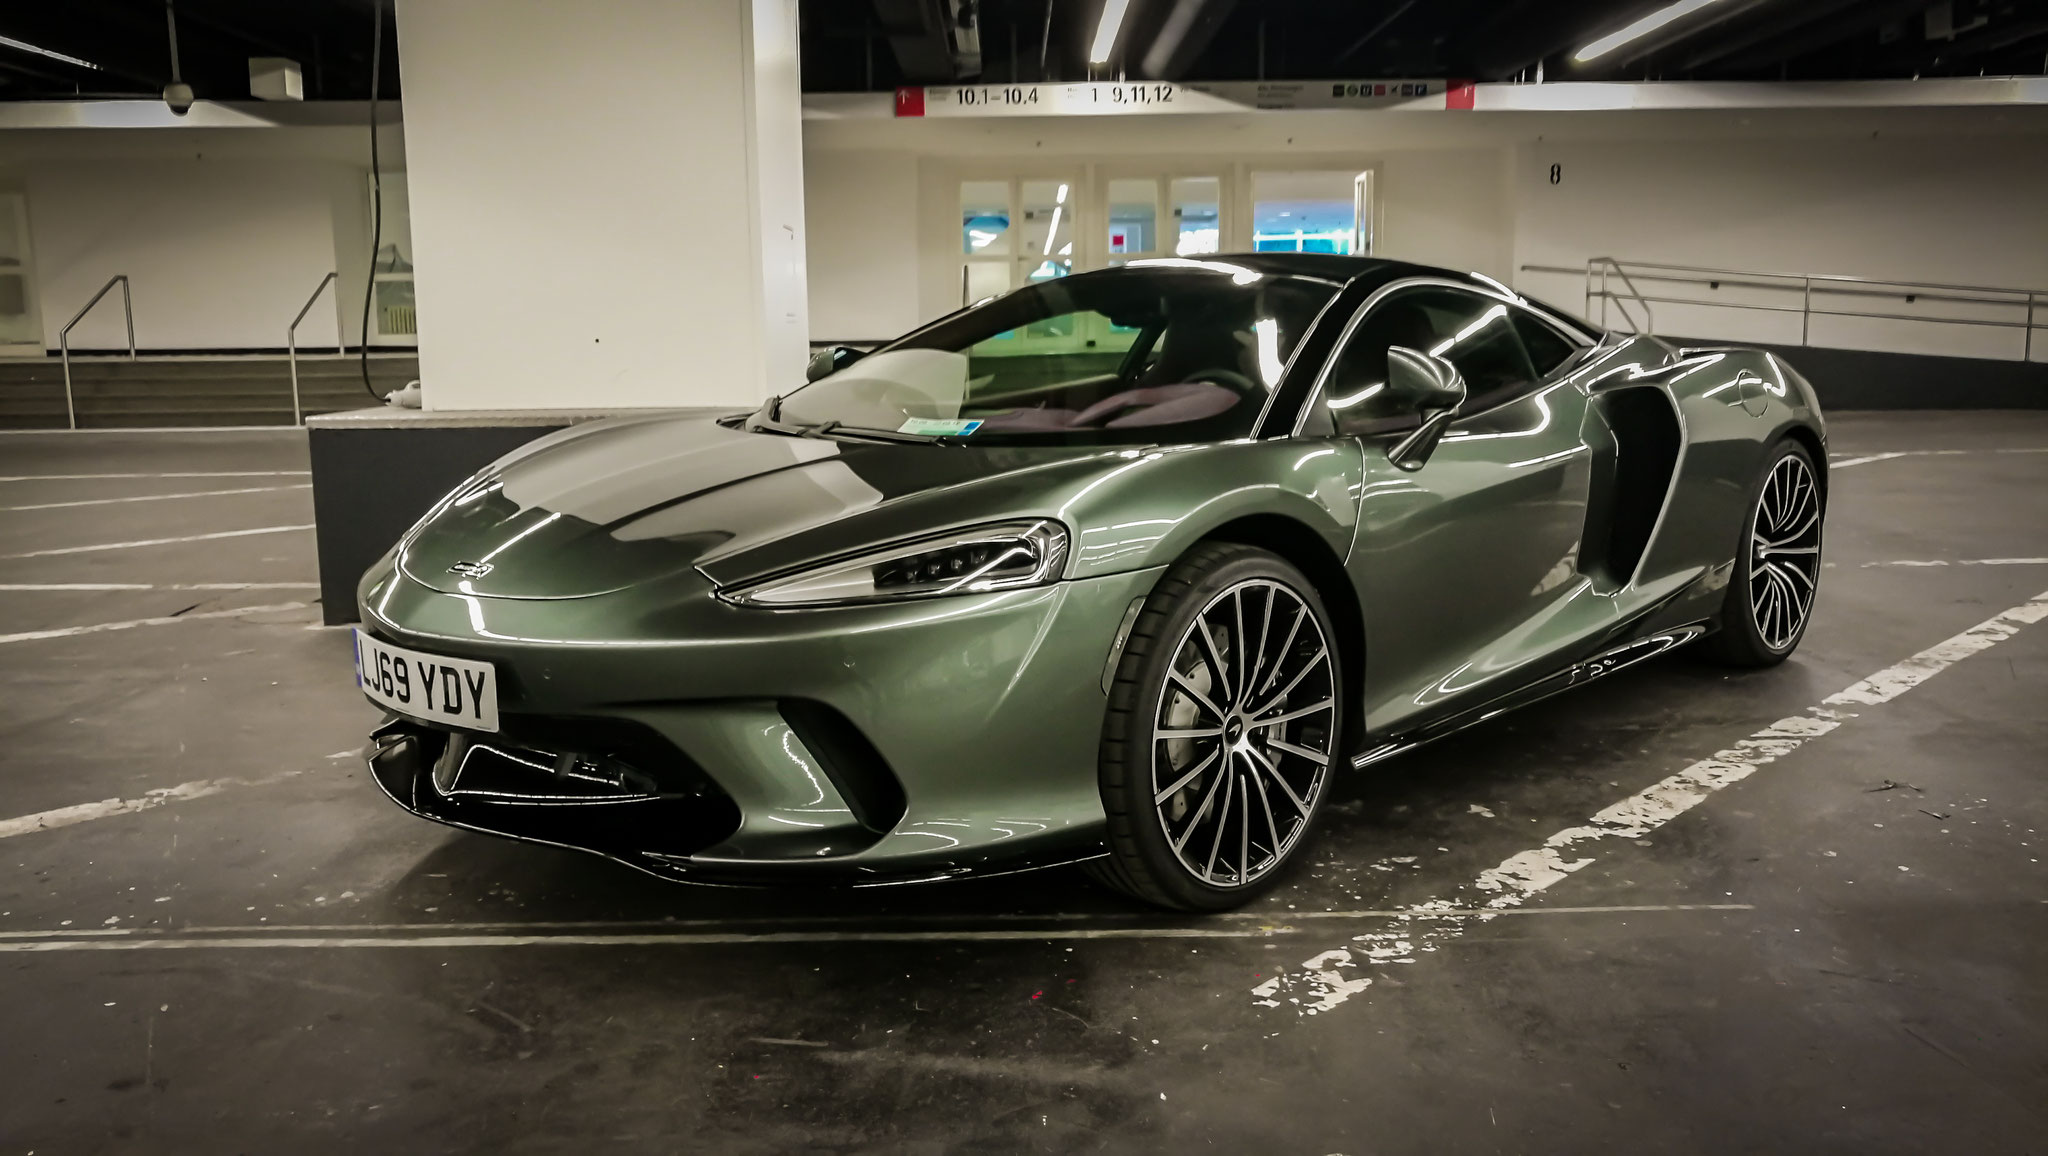 McLaren GT - LJ69-YDY (GB)